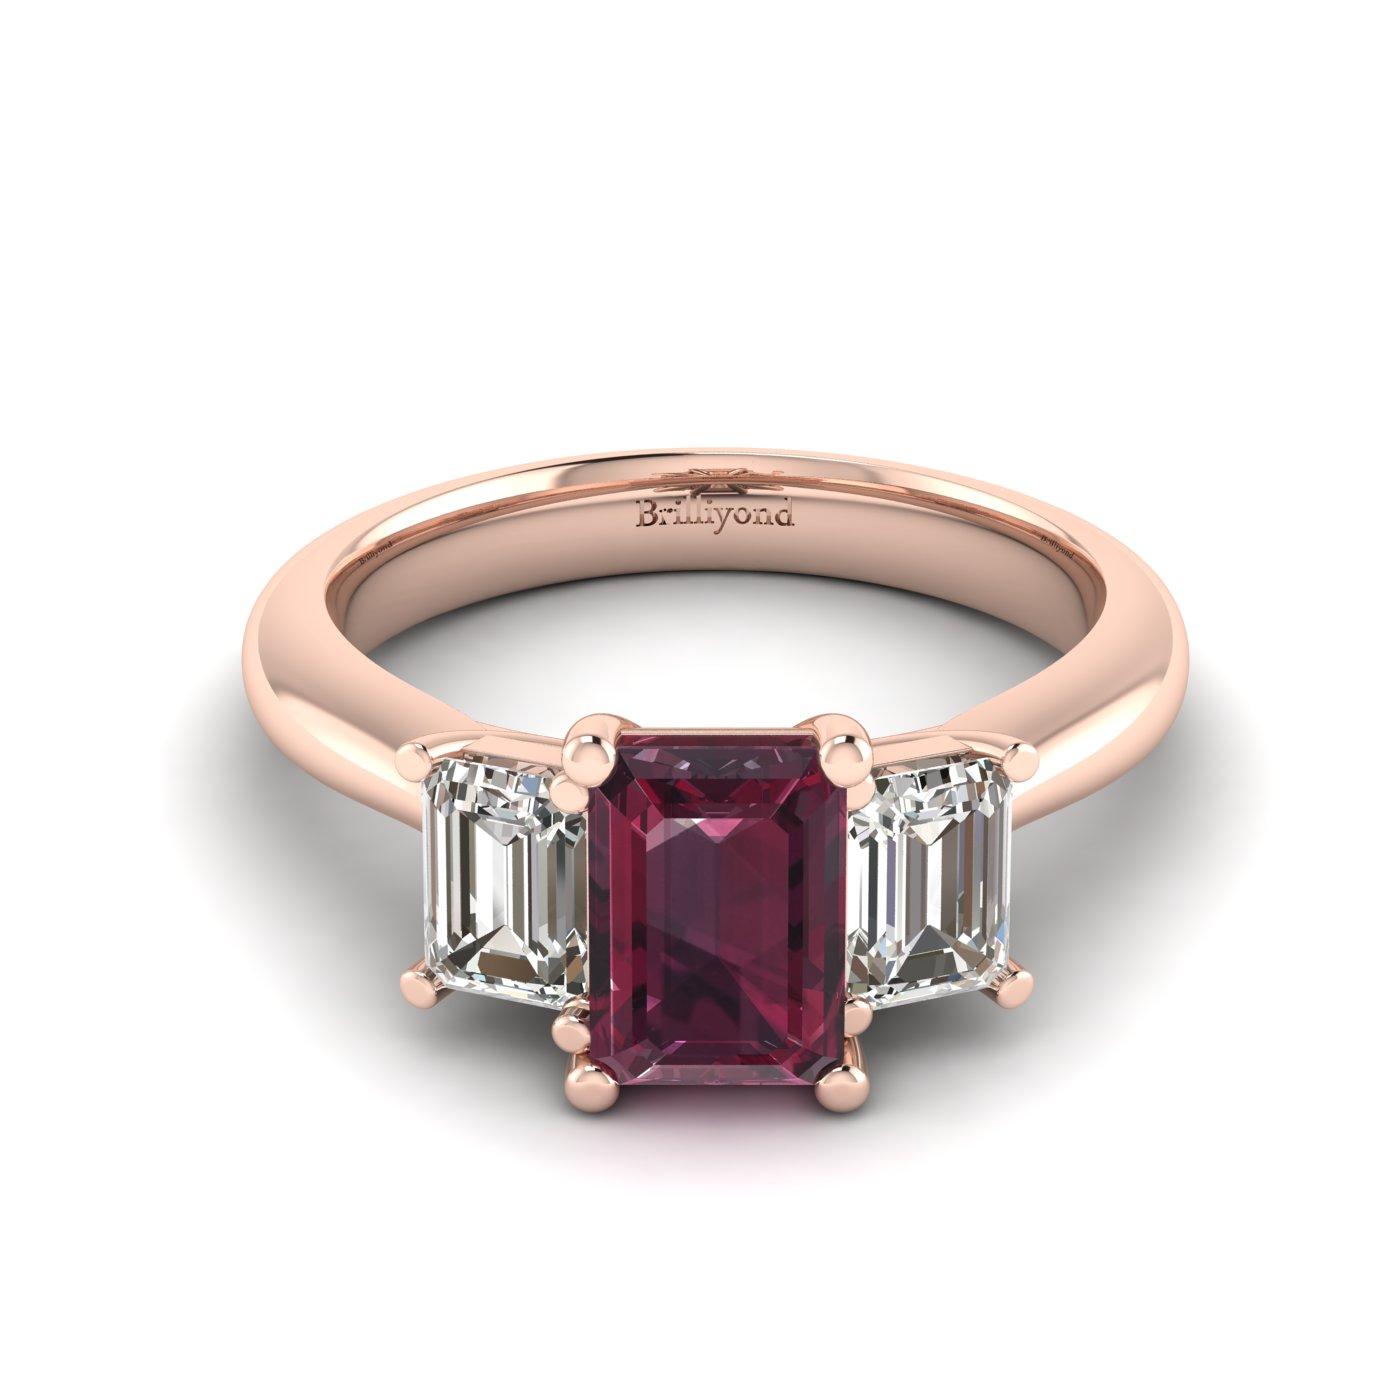 Garnet Rose Gold Emerald Cut Engagement Ring Blanche_image2